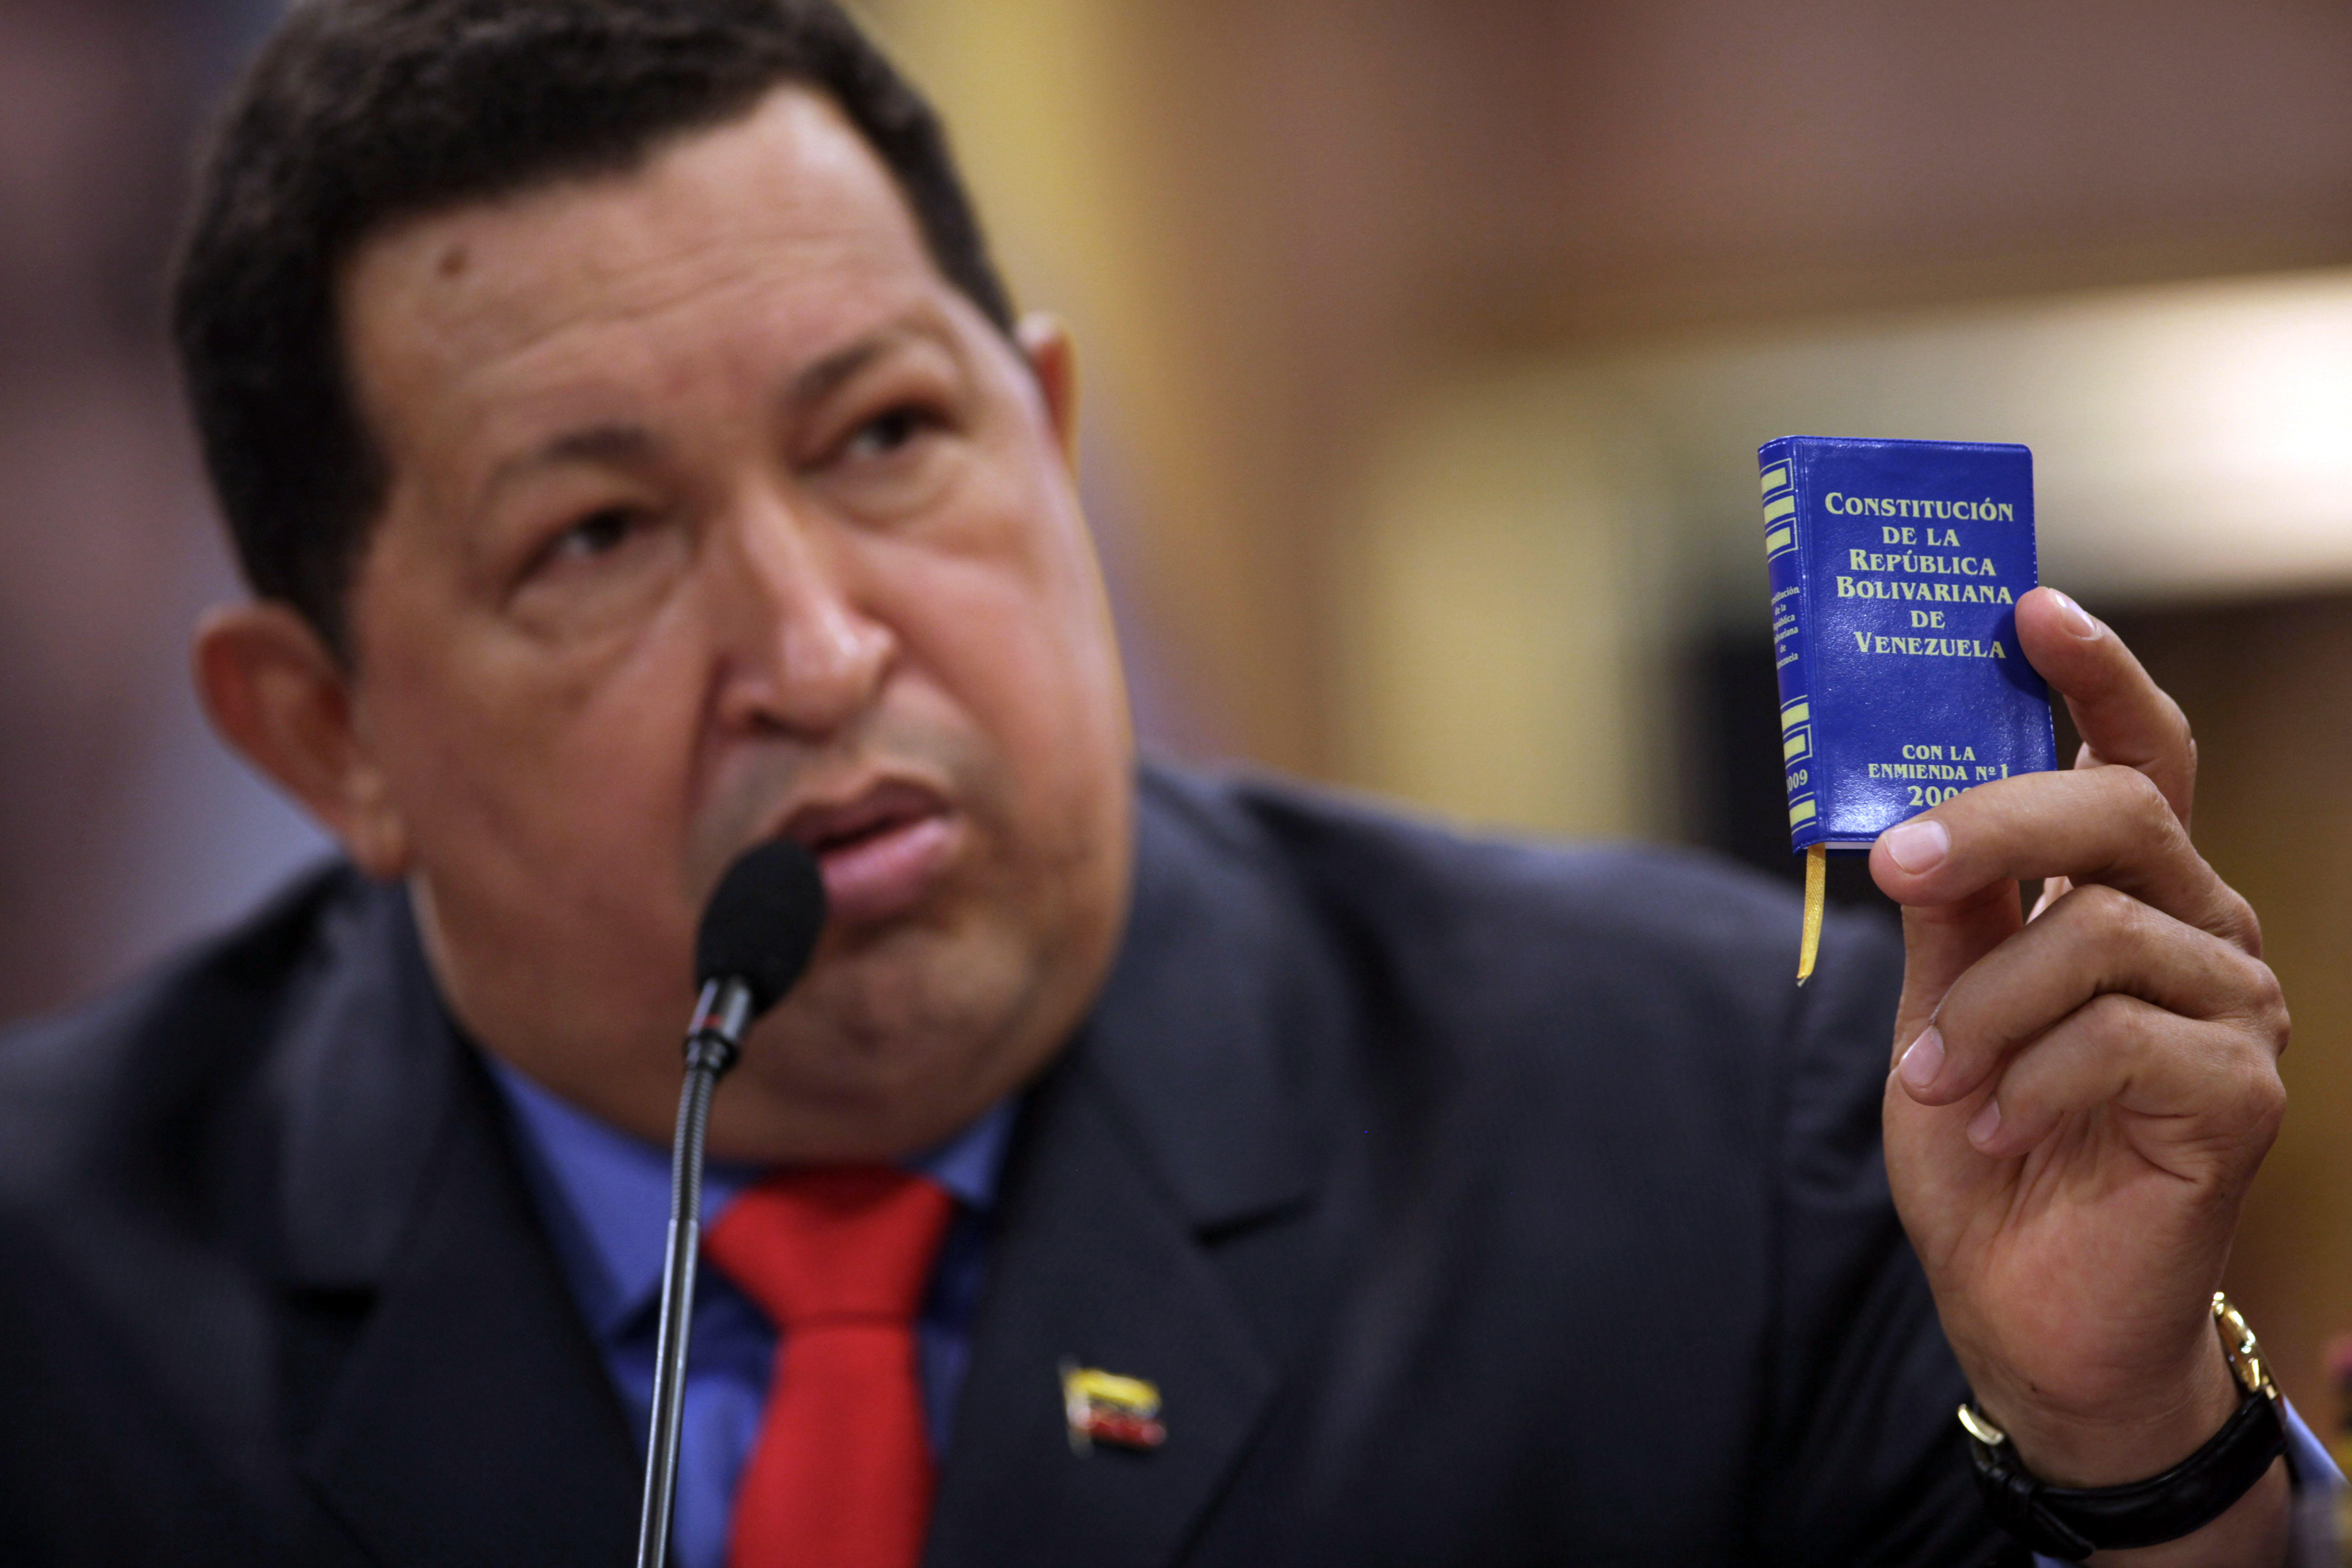 What Will Be Hugo Chávez's Fate? – Analysis